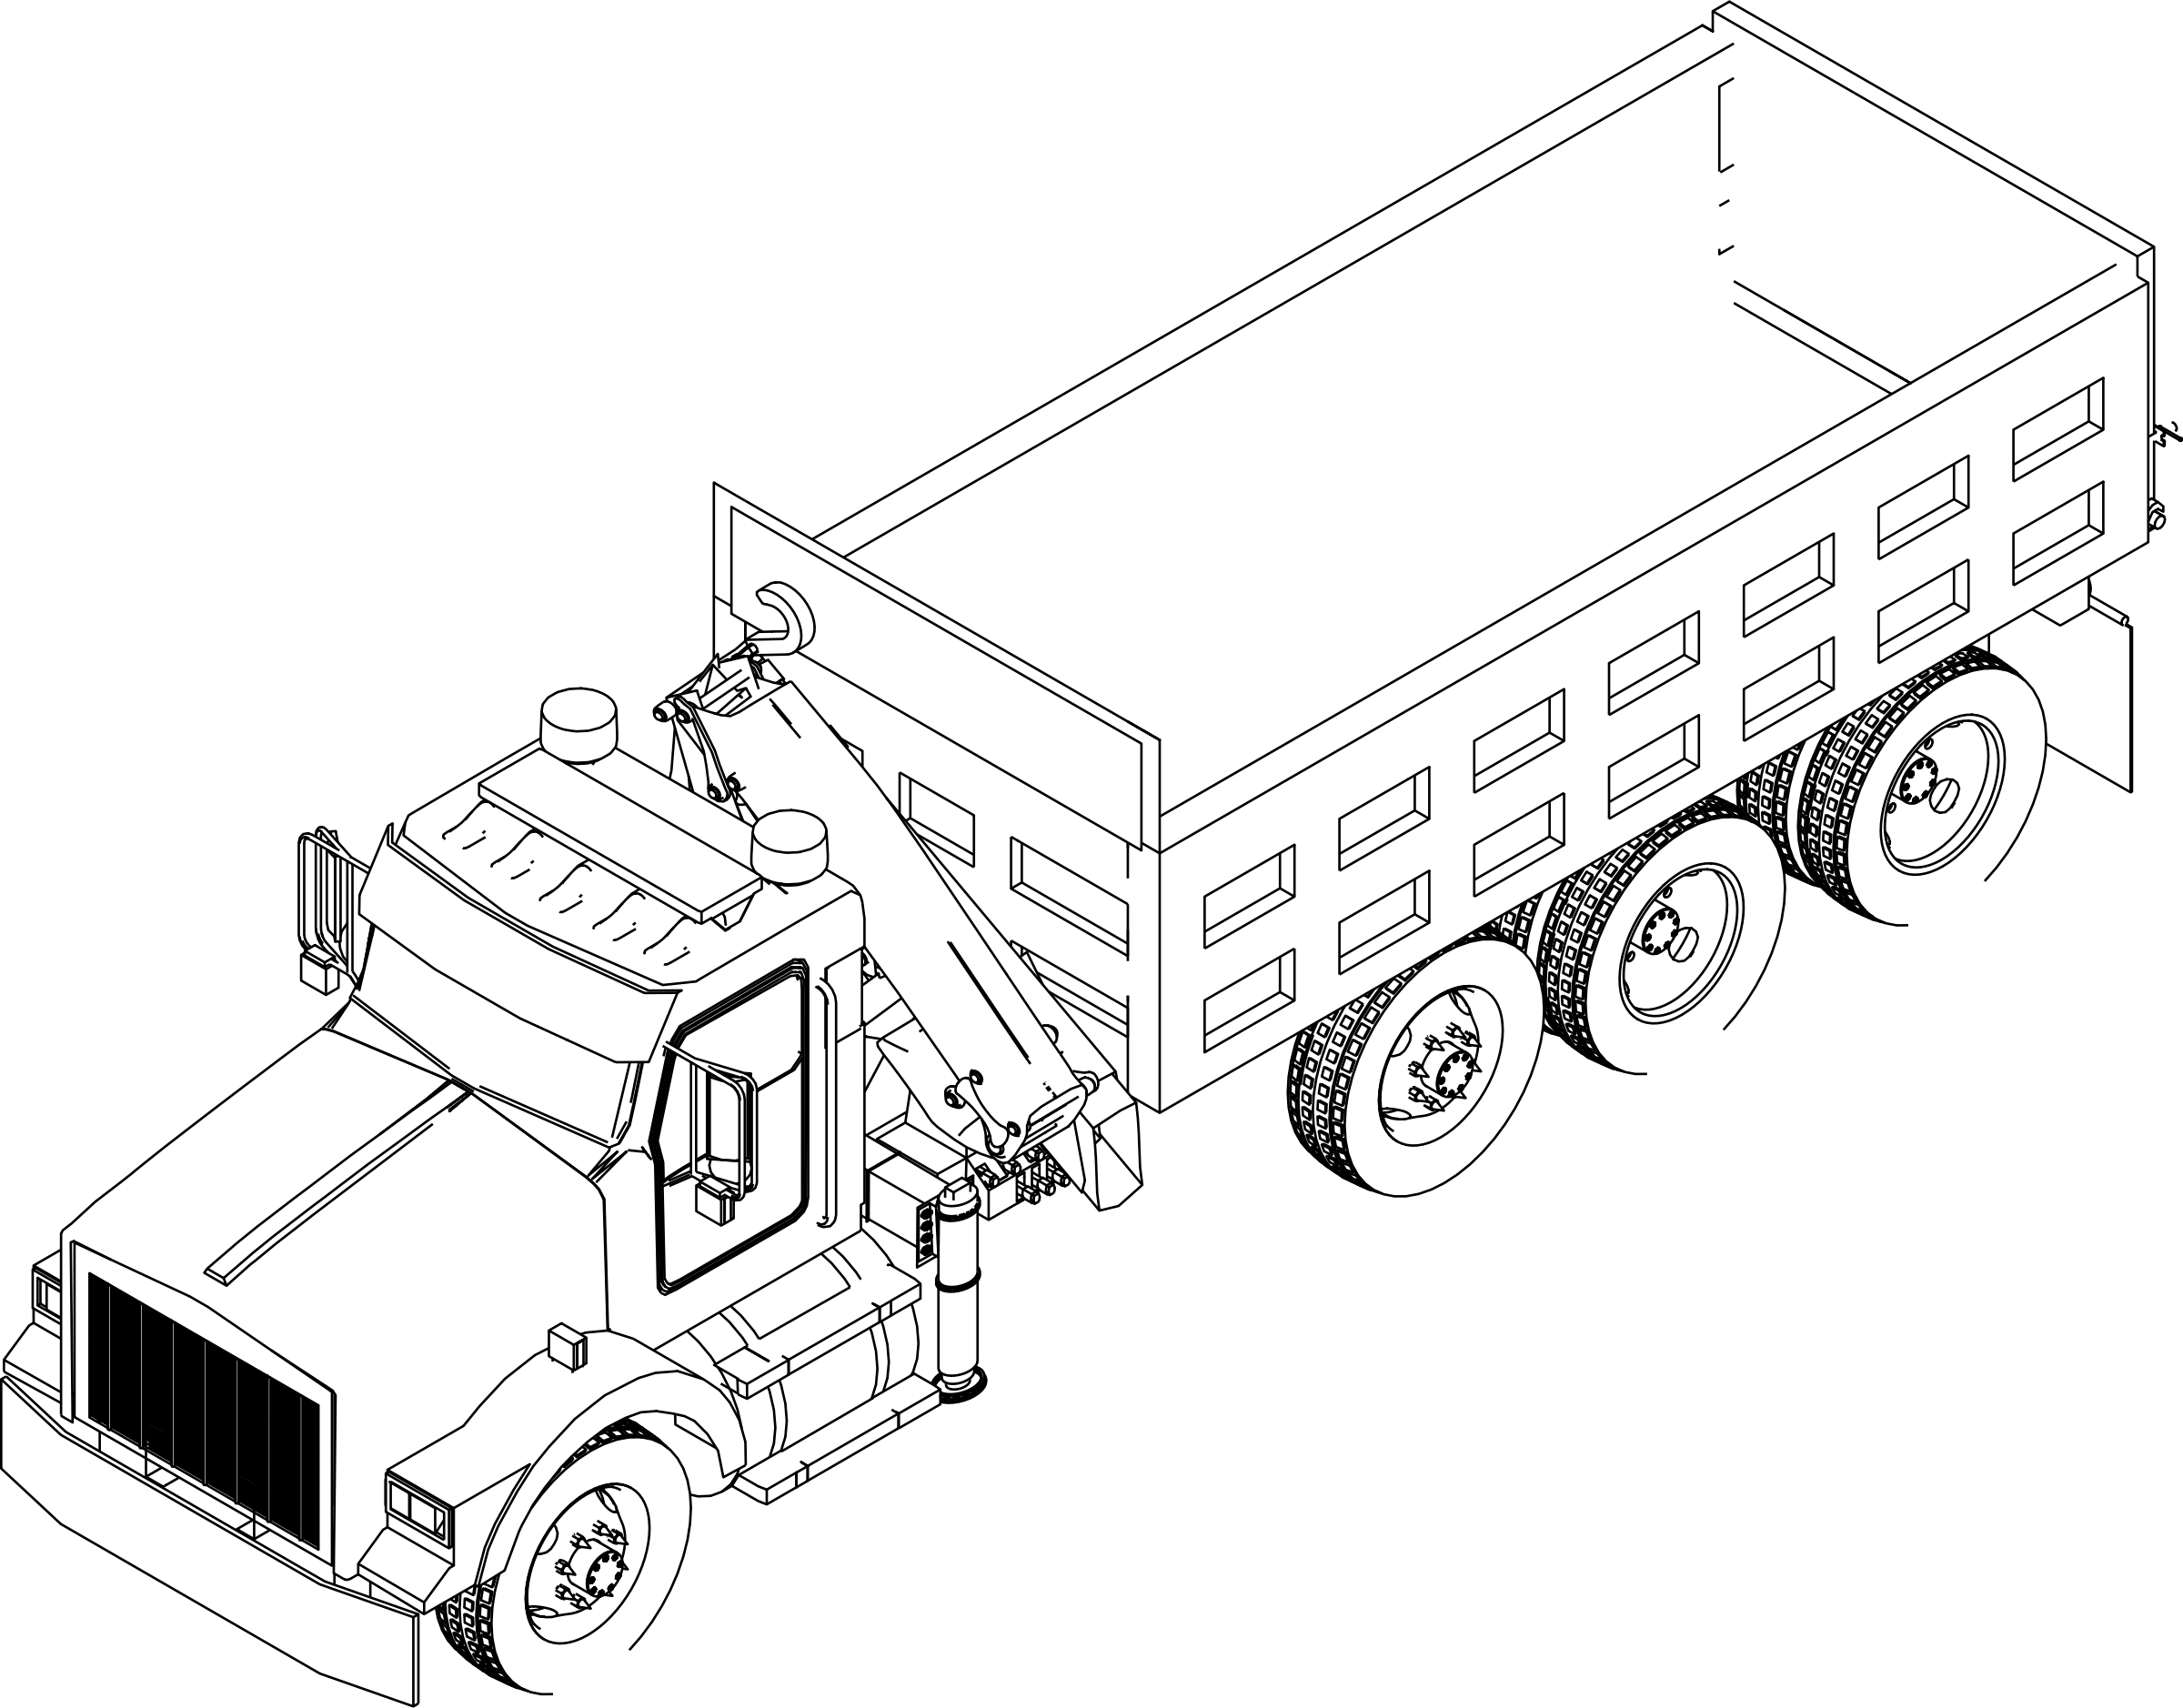 2400x1878 Clipart